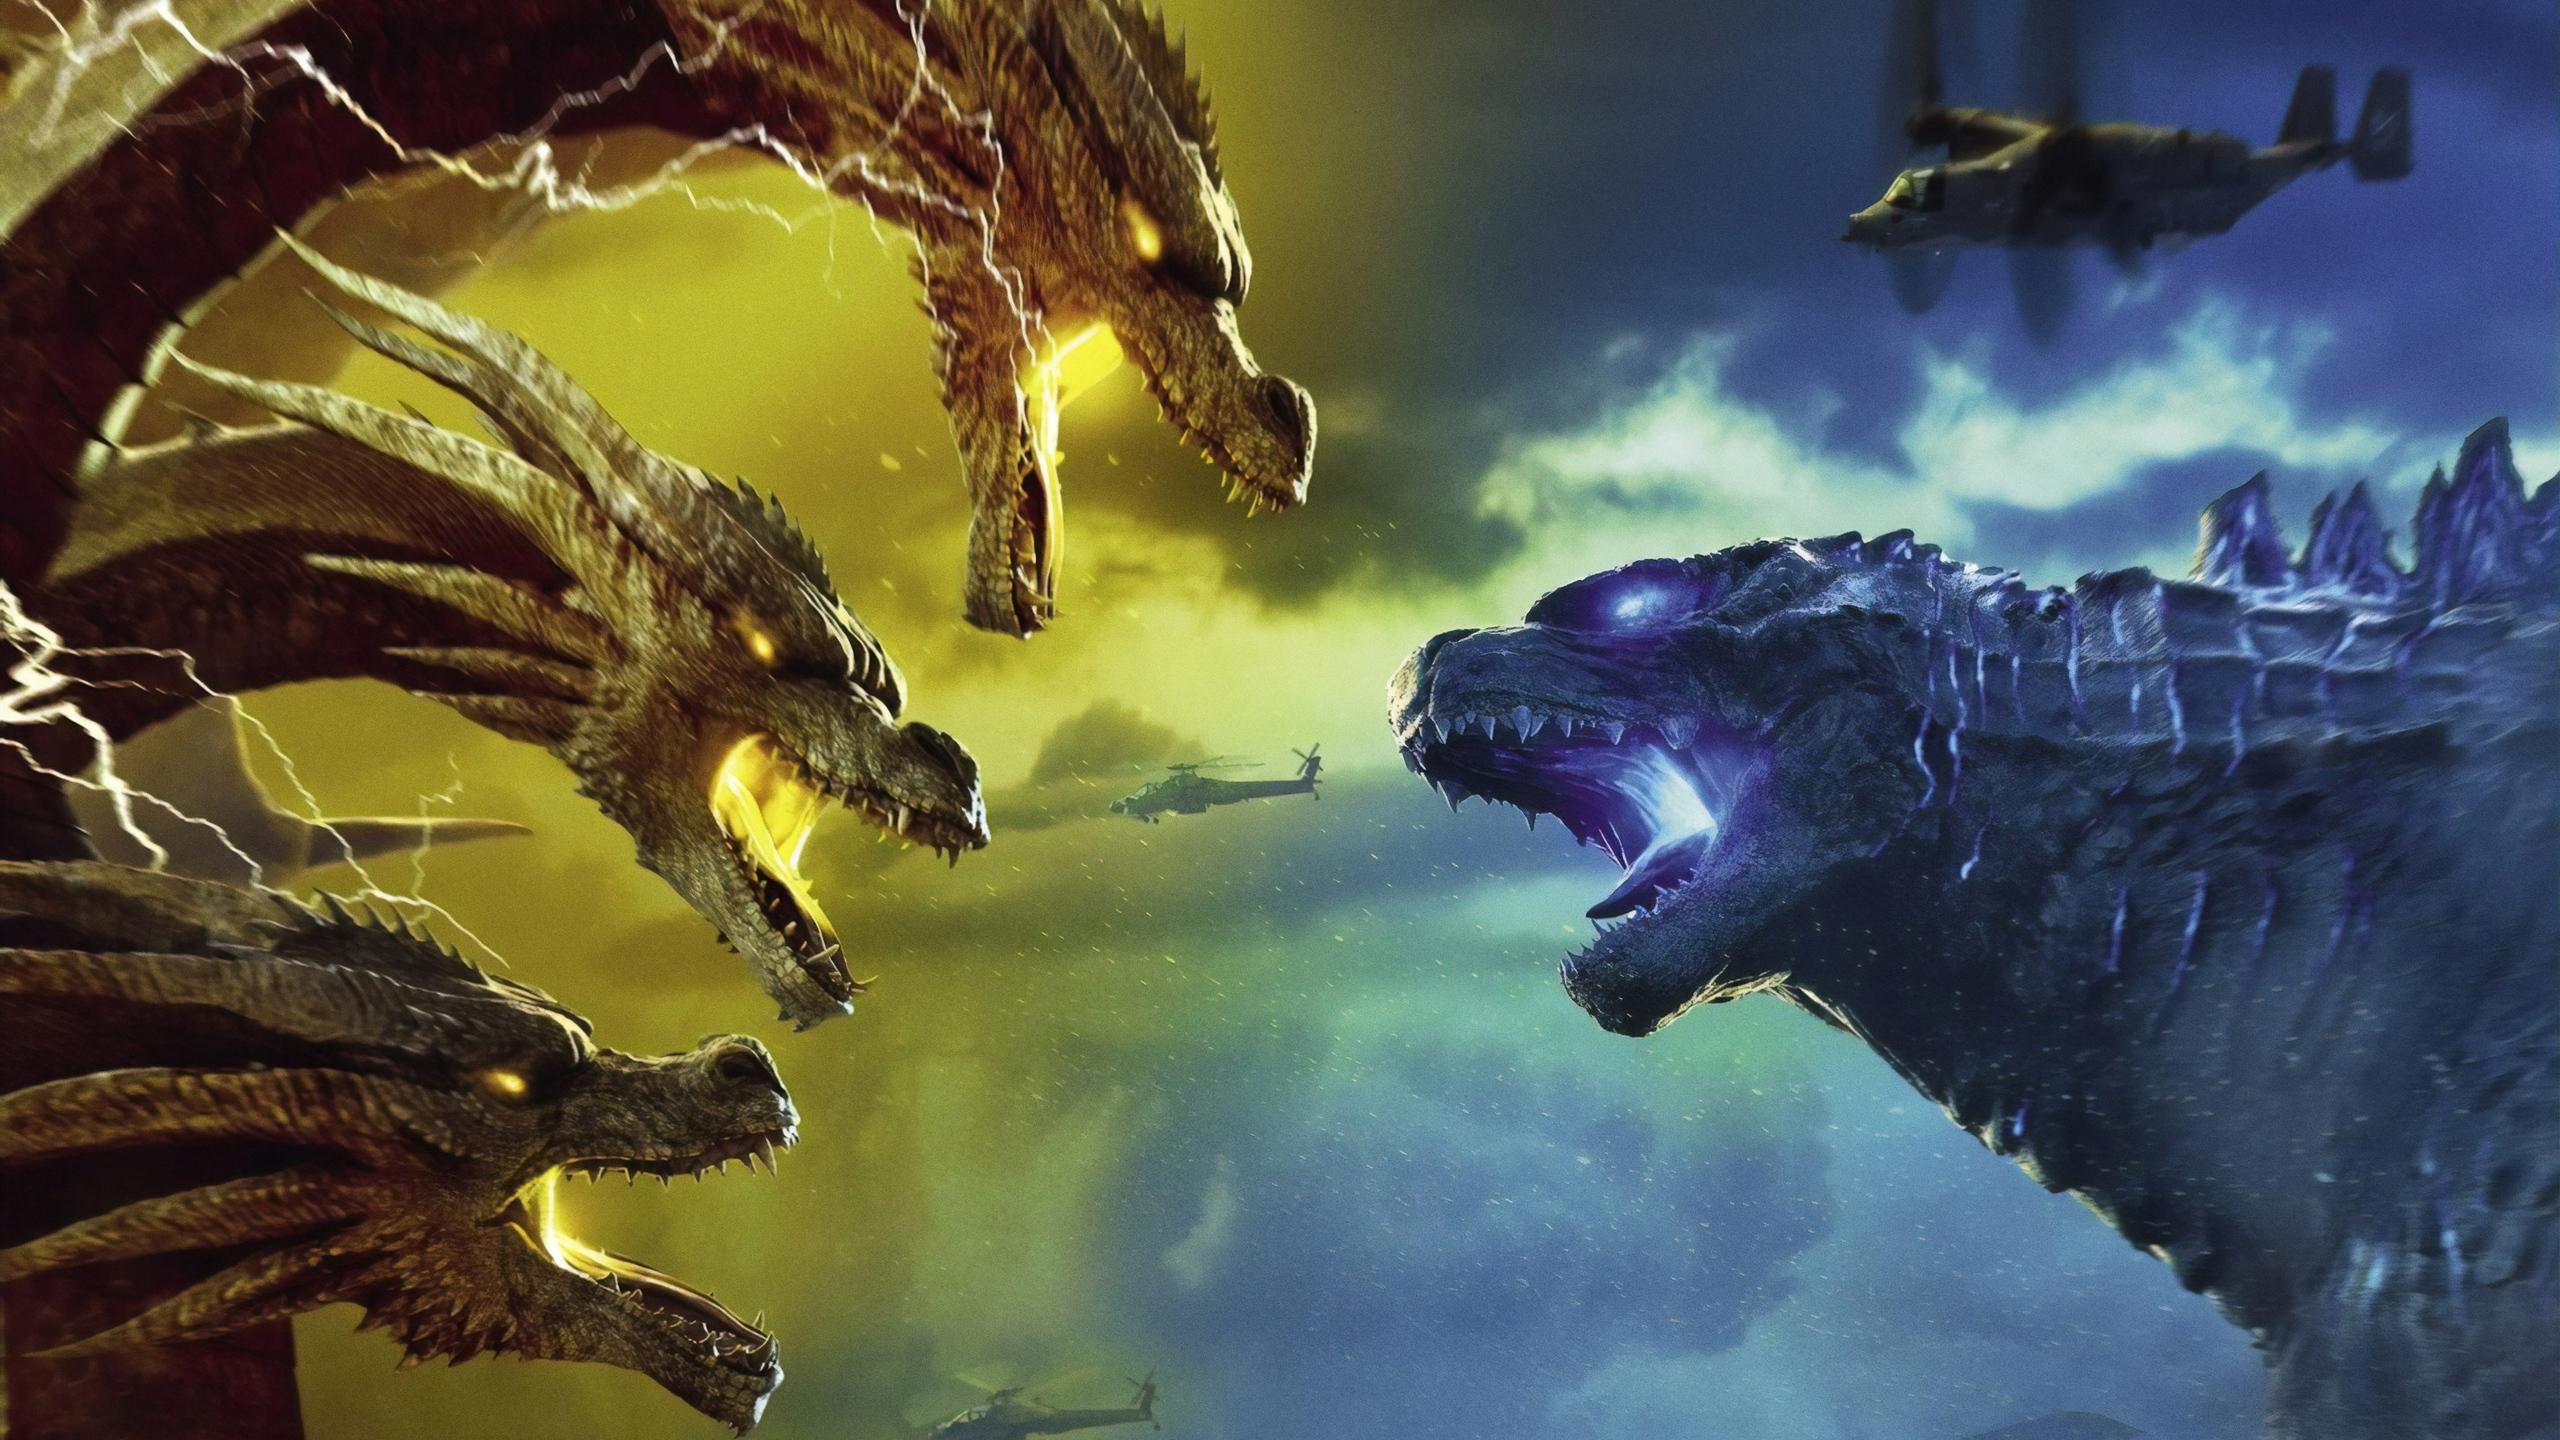 2560x1440 Godzilla King Of The Monsters 4k 1440P ...